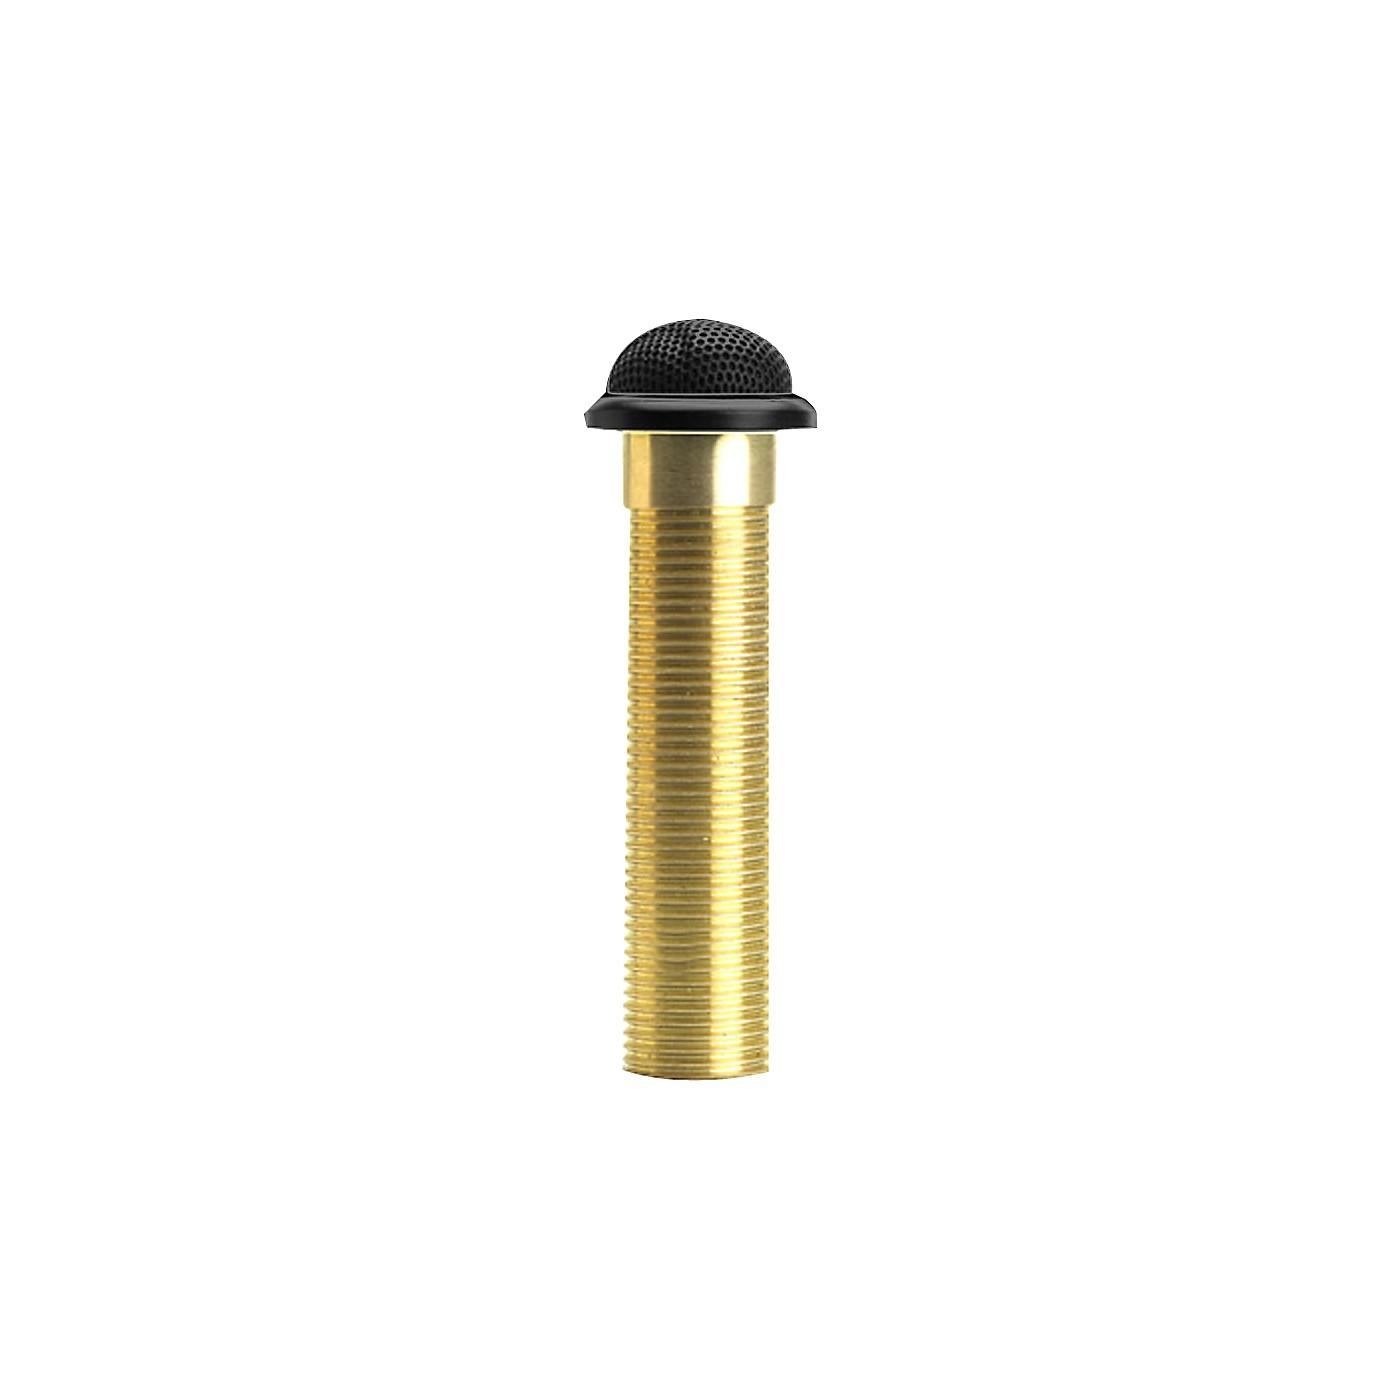 Shure MX395B Microflex Low Profile Boundary Microphone thumbnail